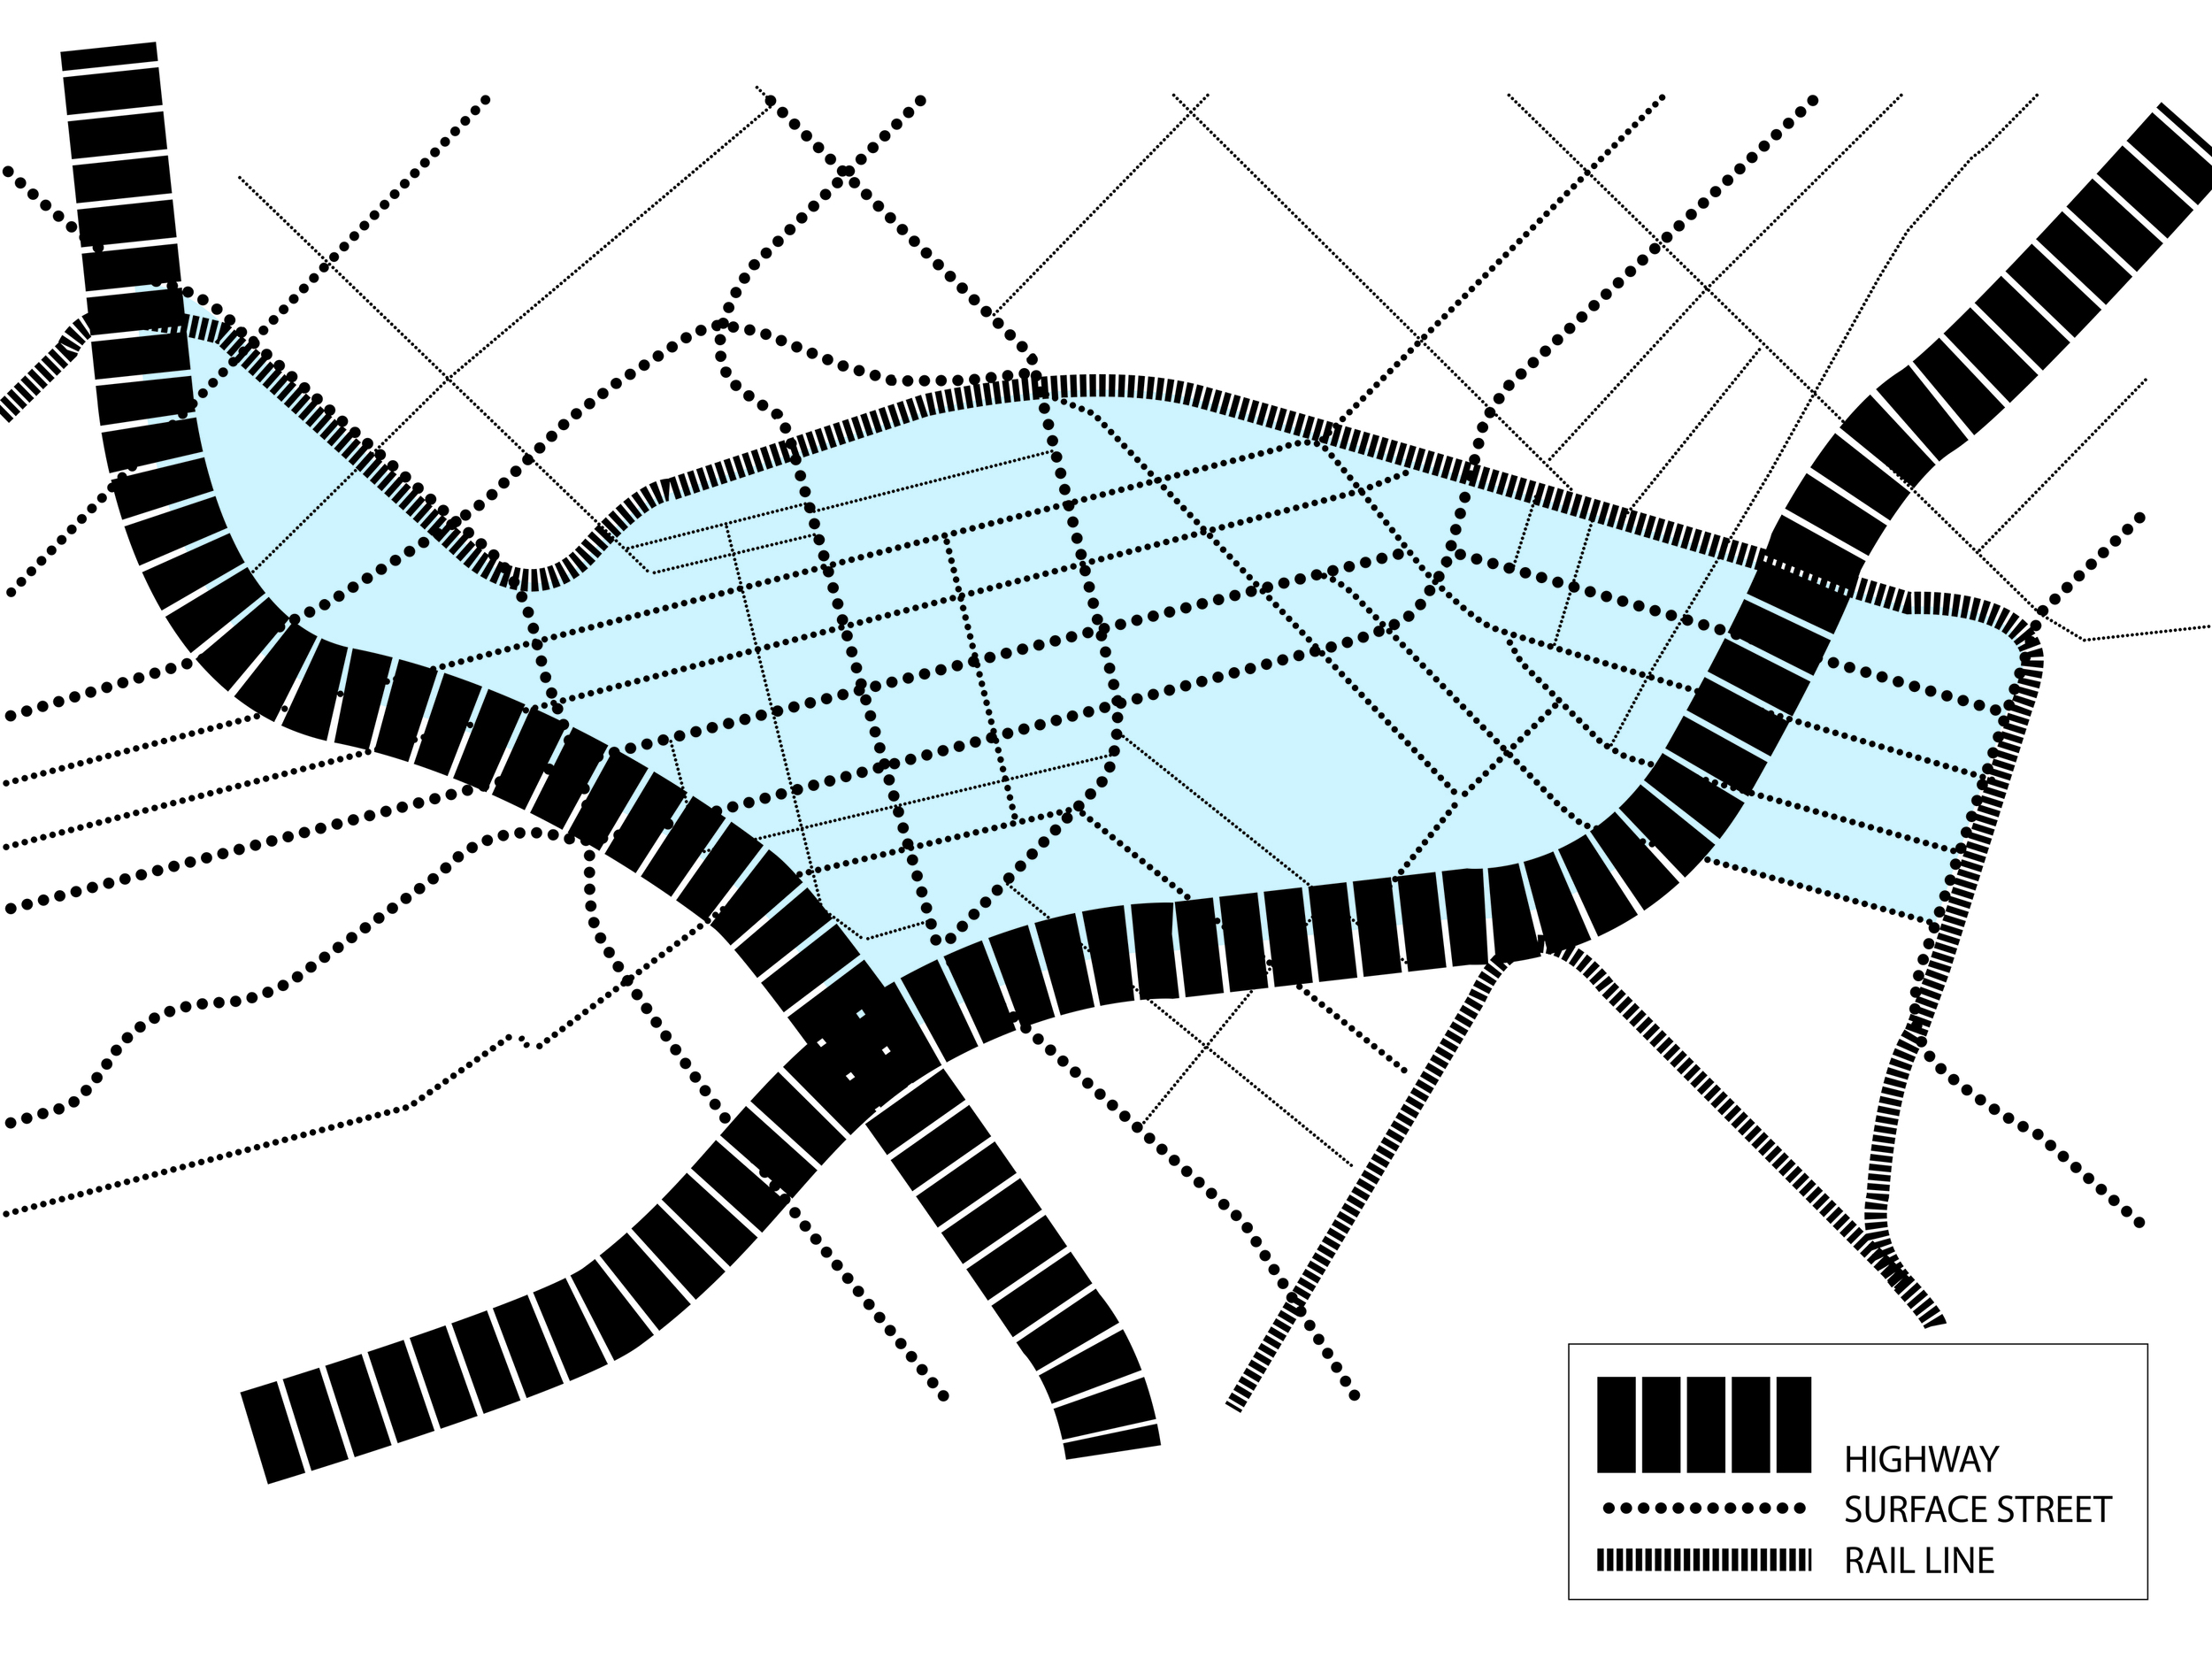 Existing Street Grid